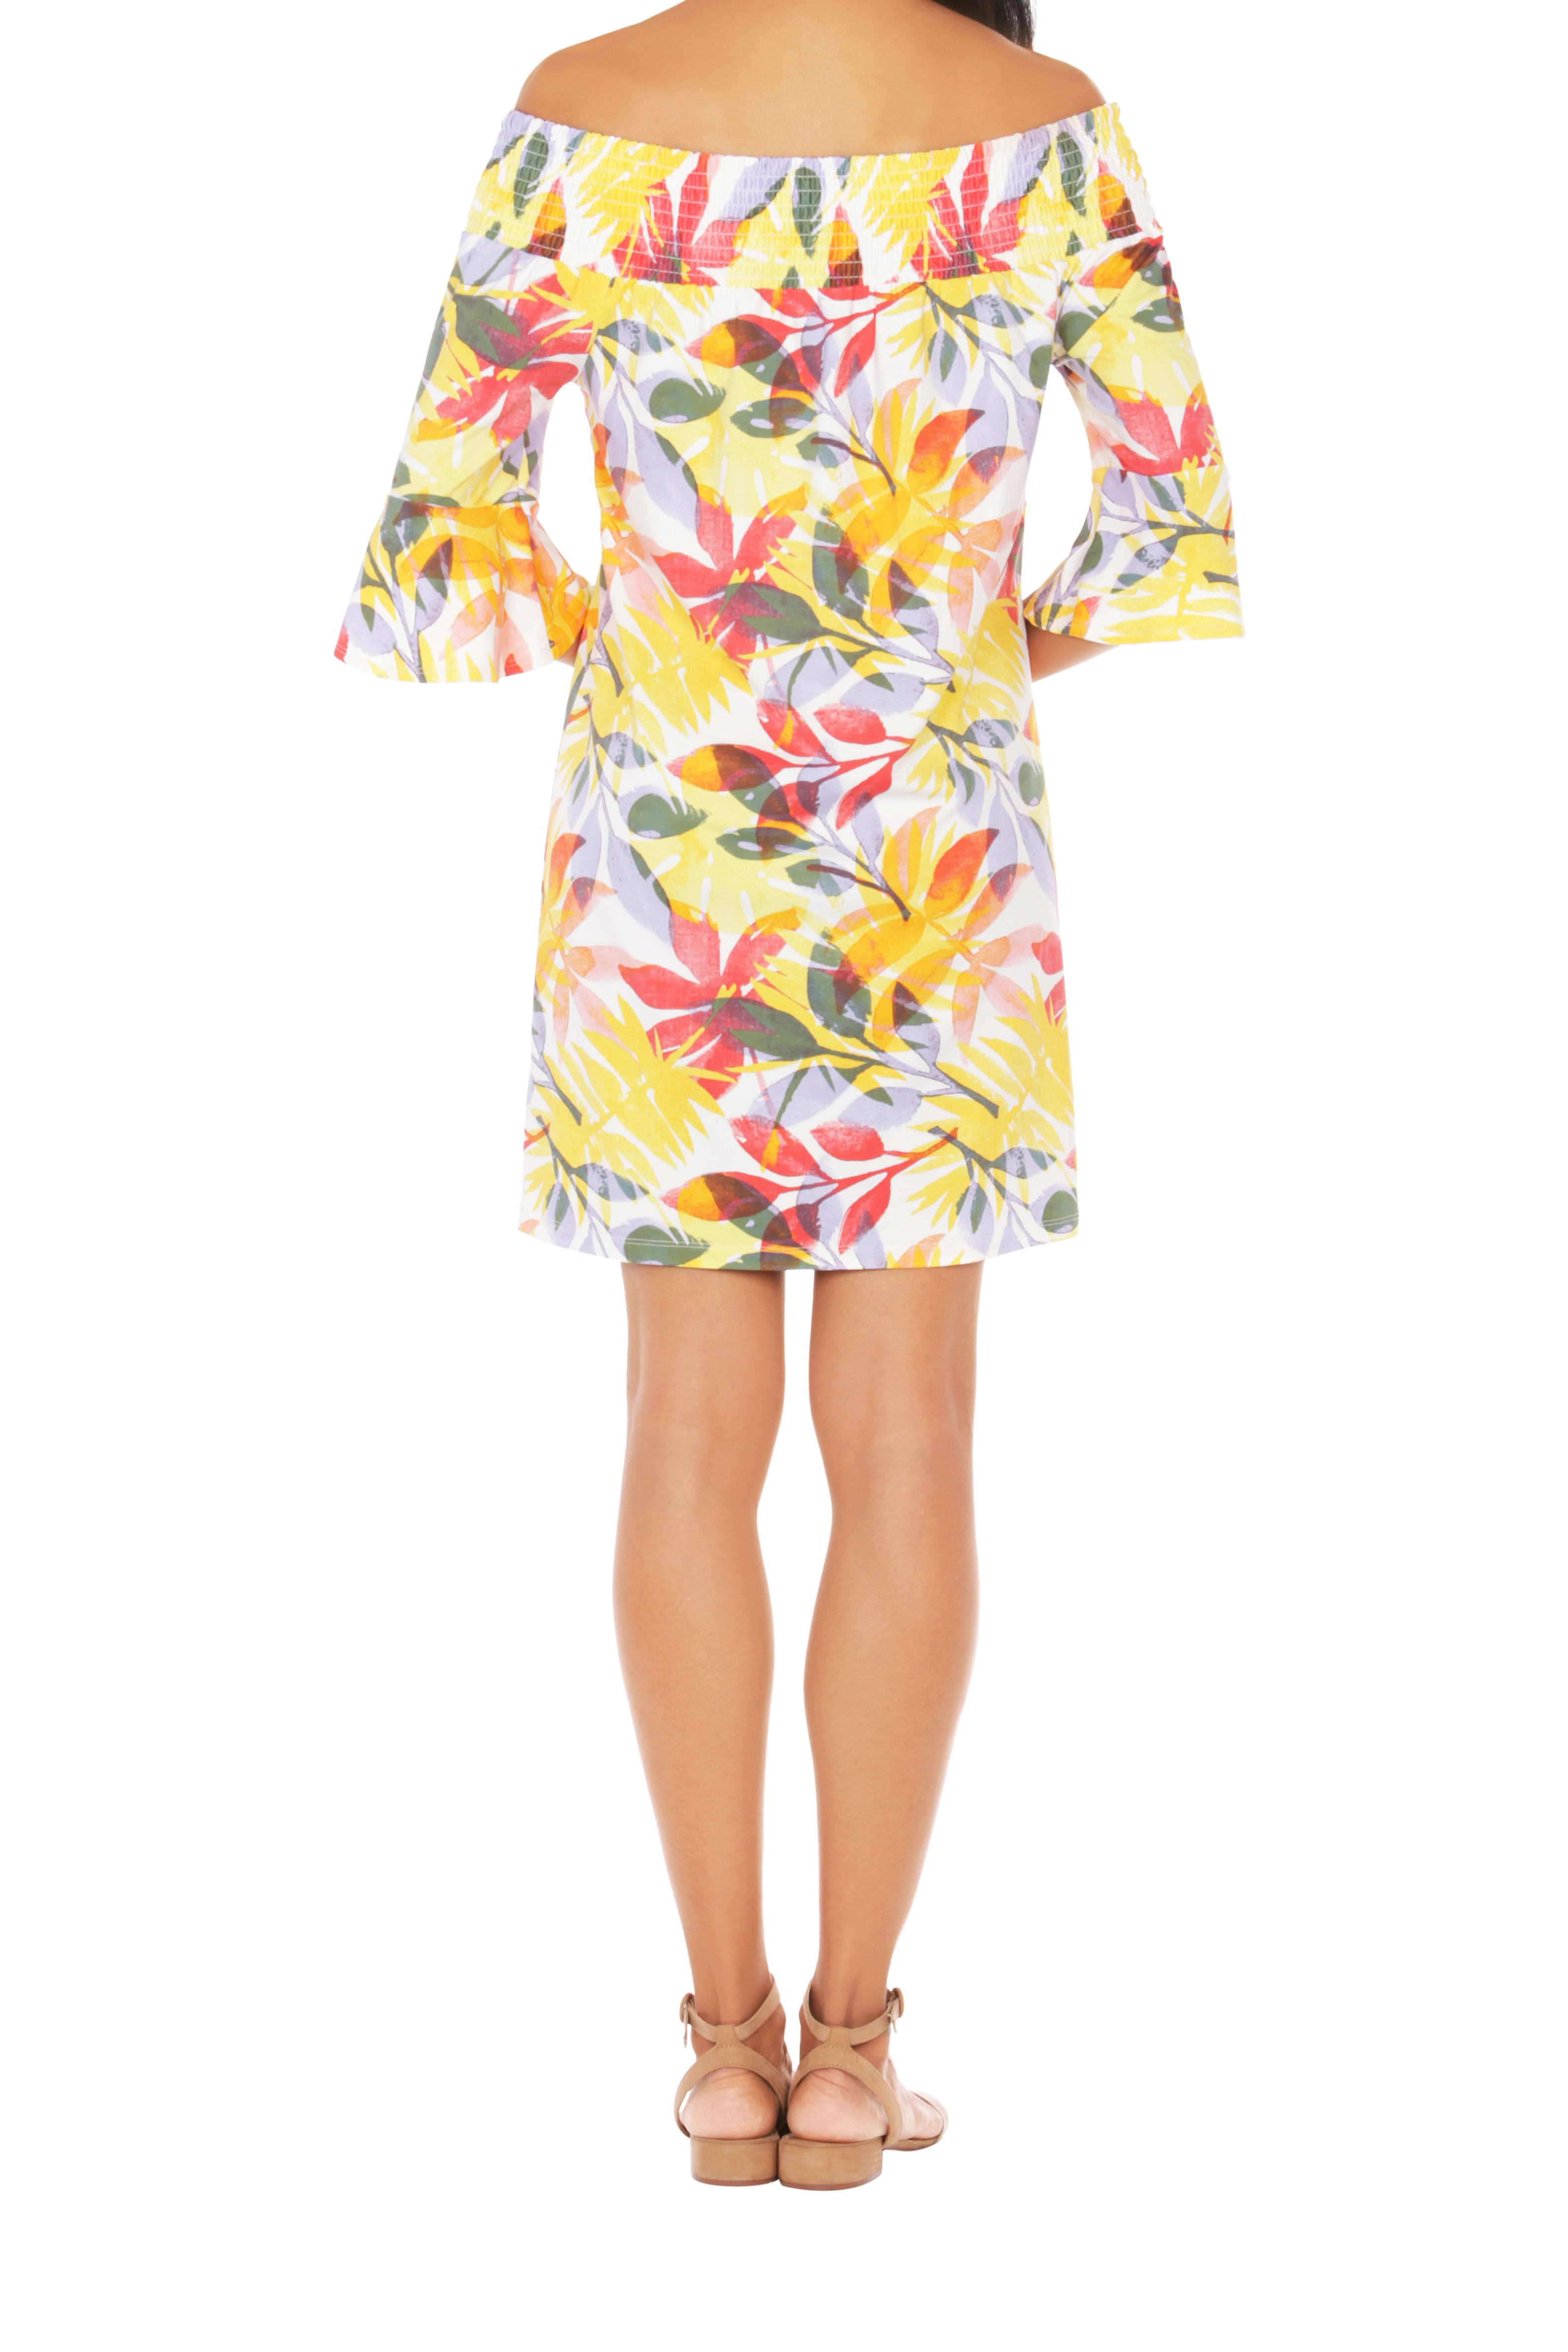 Caribbean Joe® UPF Sun Protection Off the Shoulder Dress - Sunrise - Back